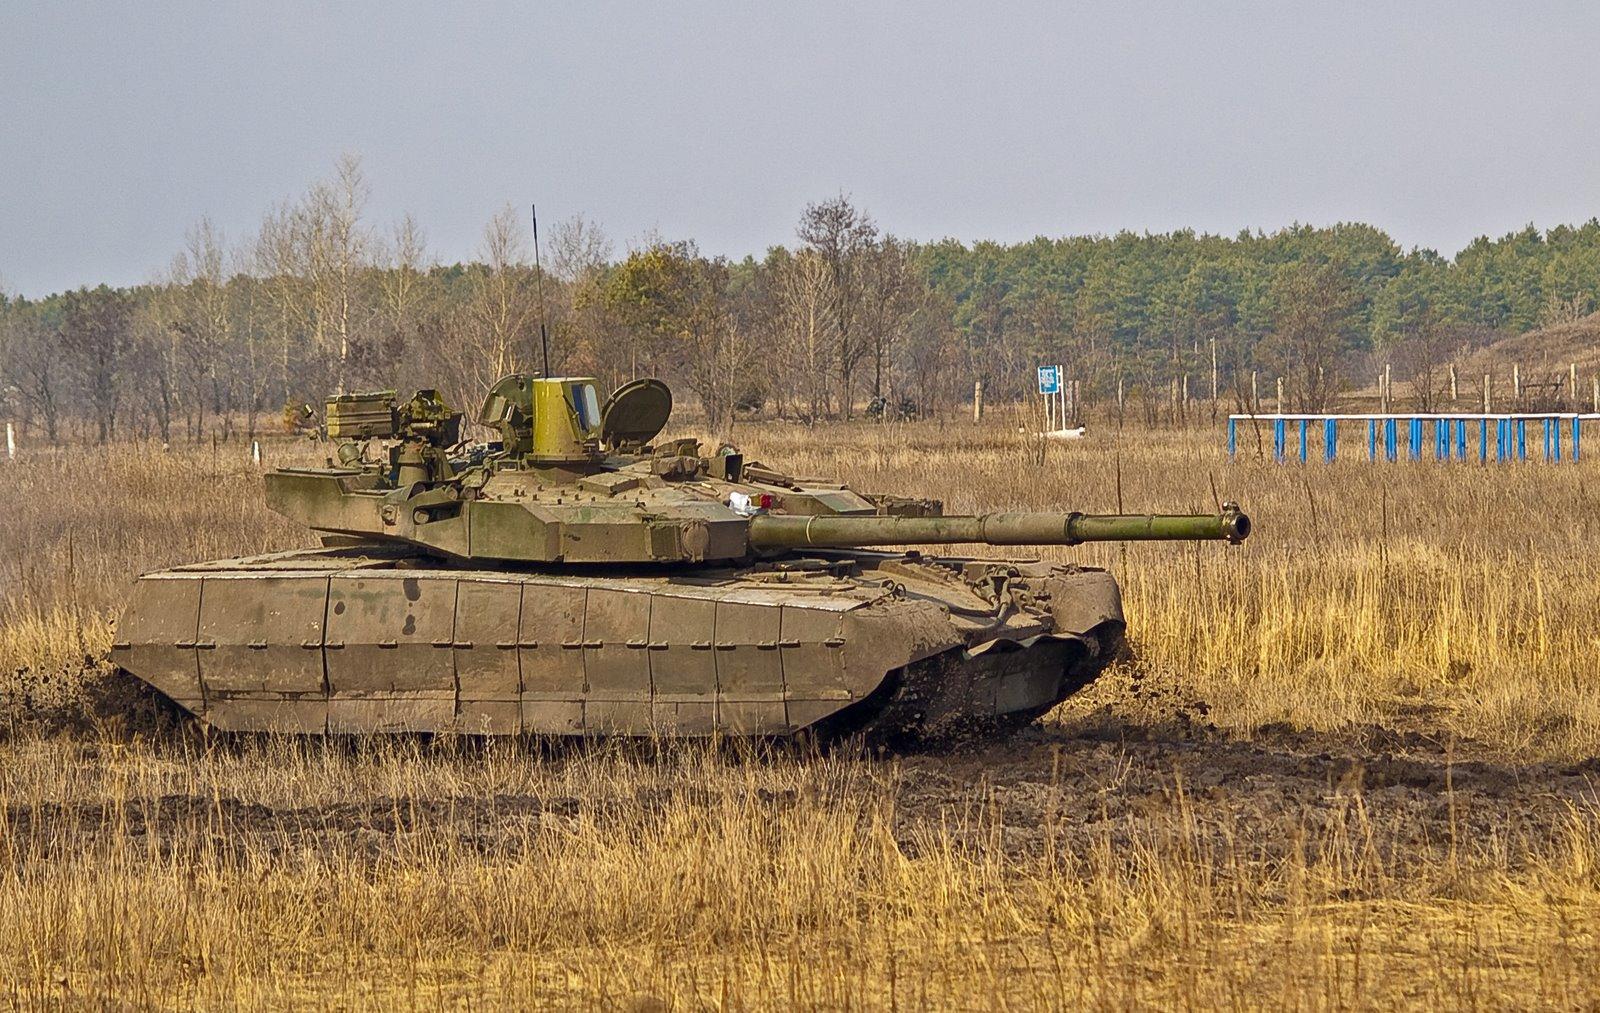 MBT_Oplot_sprava_gryaz_809.jpg